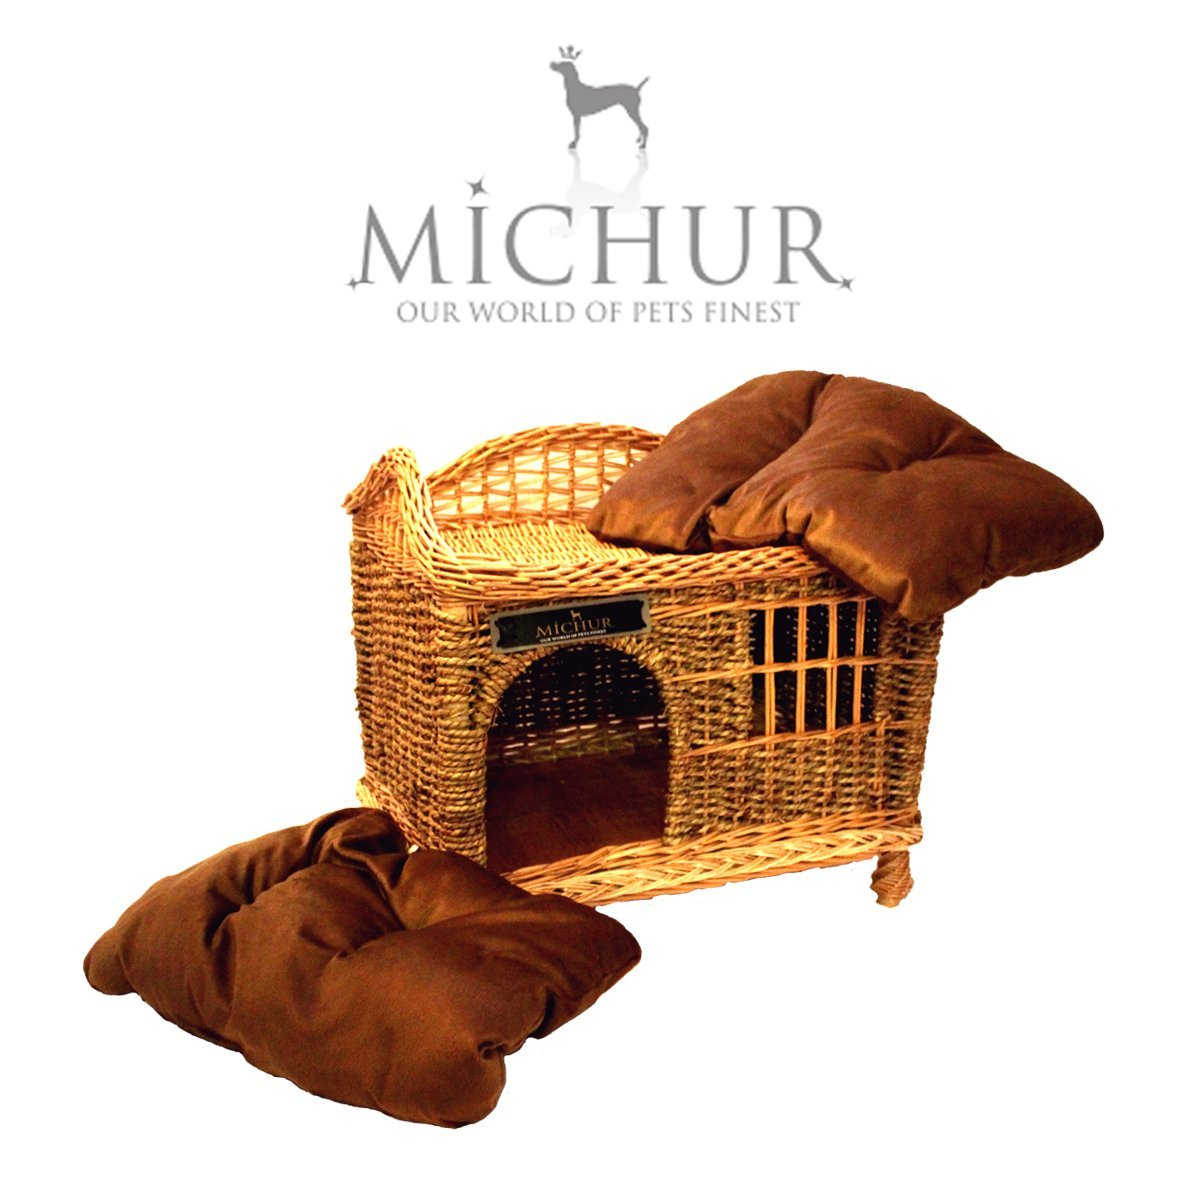 Willow wicker cat dog house bed Cognac  (60x40x50cm) incl. pillows